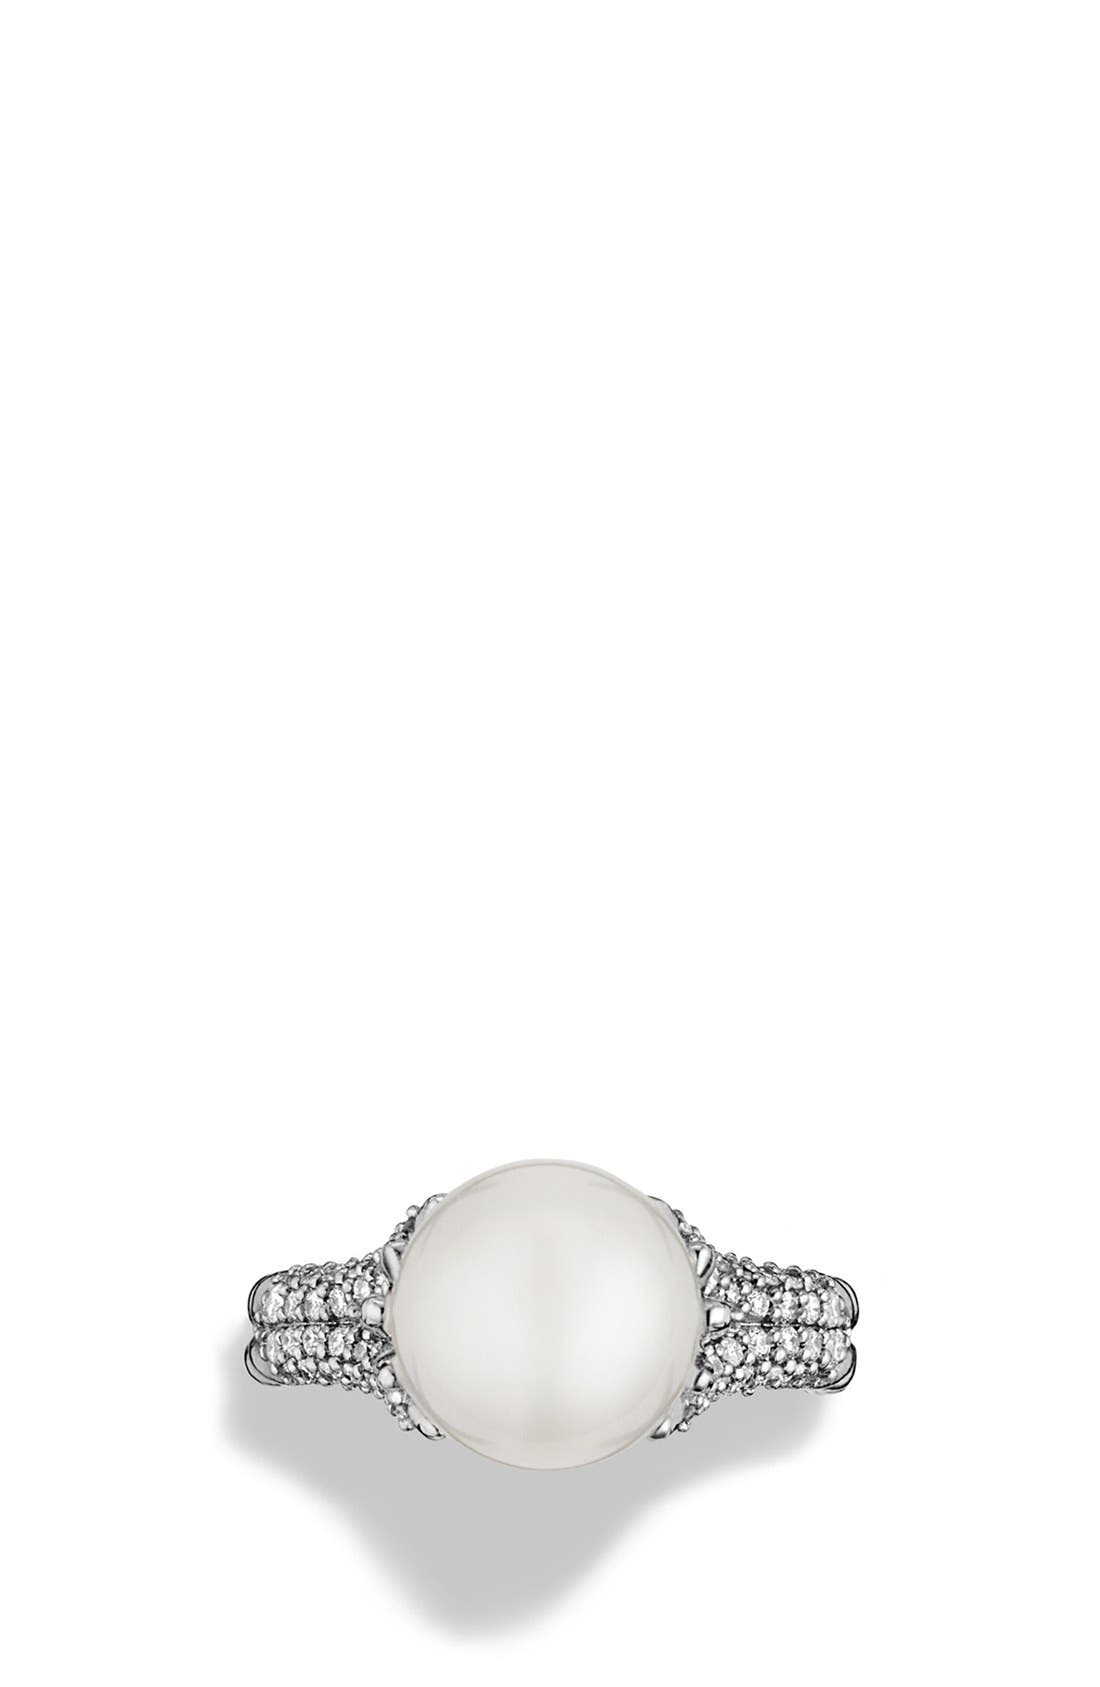 Alternate Image 3  - David Yurman 'Starburst' Pearl Ring with Diamonds